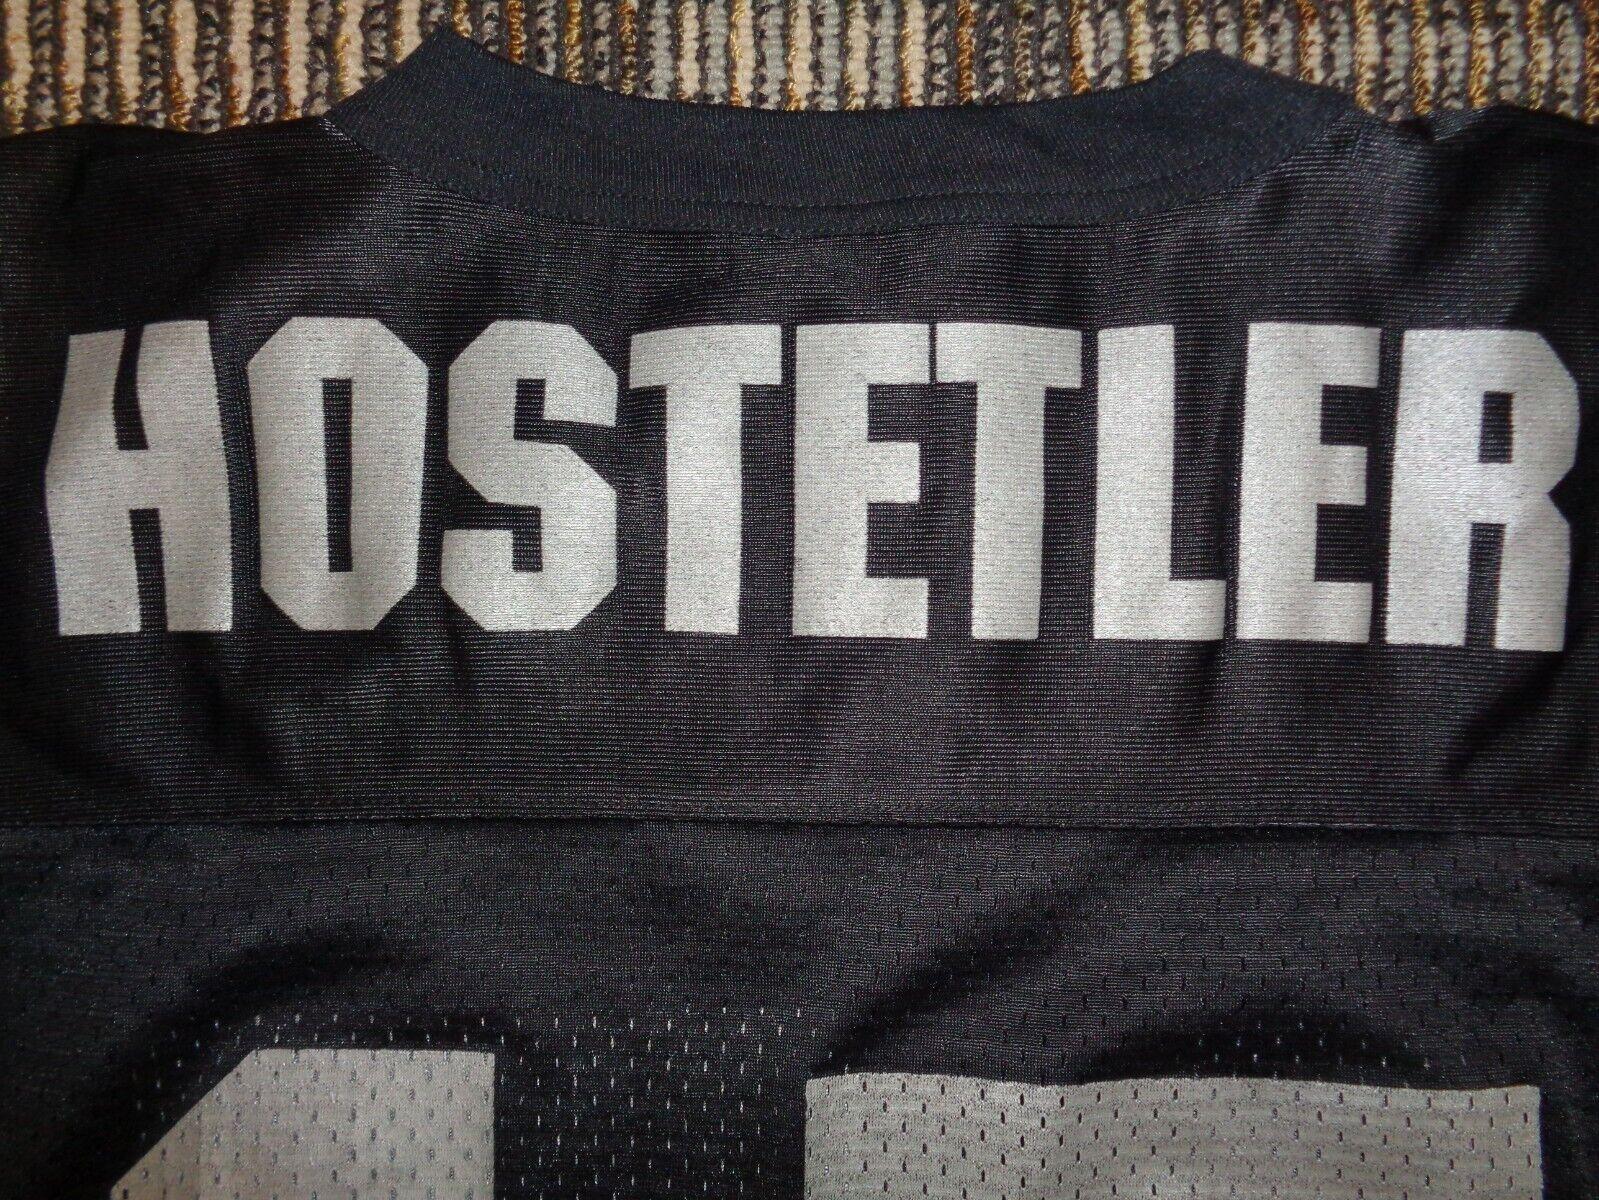 JEFF HOSTETLER 15 LOS ANGELES LAS VEGAS RAIDERS STARTER NFL GAME MENS JERSEY  - $69.99